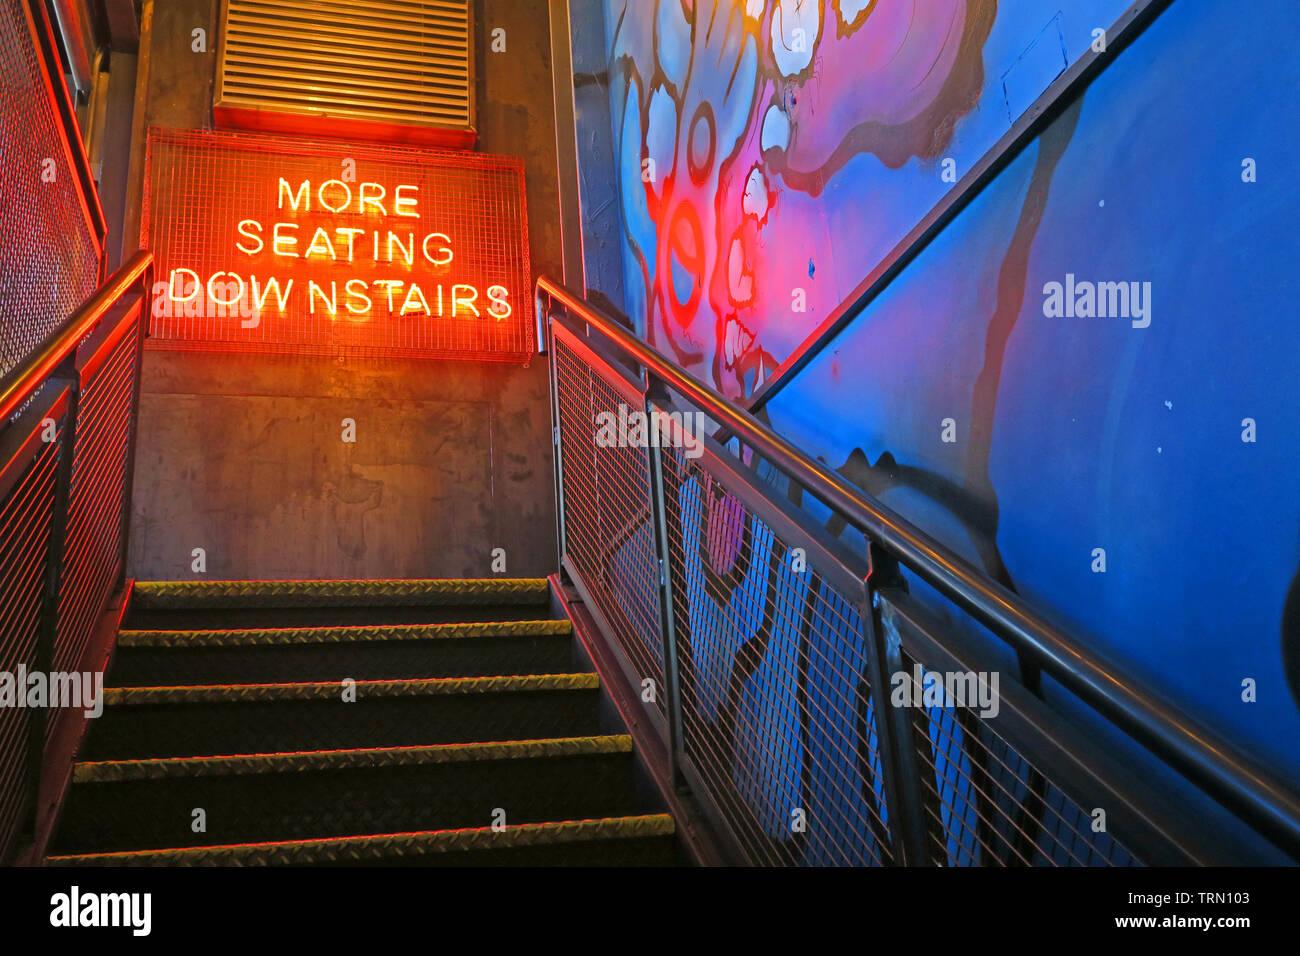 GoTonySmith,@HotpixUK,HotpixUK,North East,North East Scotland,Scottish,UK,City Centre,The Granite City,Northeast,neon,sign,orange,BrewDog,Brew Dog,Brewdog Aberdeen,brewing,brewery,red neon,night,lit,lights,More seating,down stairs,basement,basement bar,More Seating Downstairs,art,red,Aberdeen Made,Made In Aberdeen,CastlegateBar,Union Street,Aberdeen,AB11 5BU,AB11,5-9 Union St,Aberdeen Castlegate,draft,small batch,small-batch